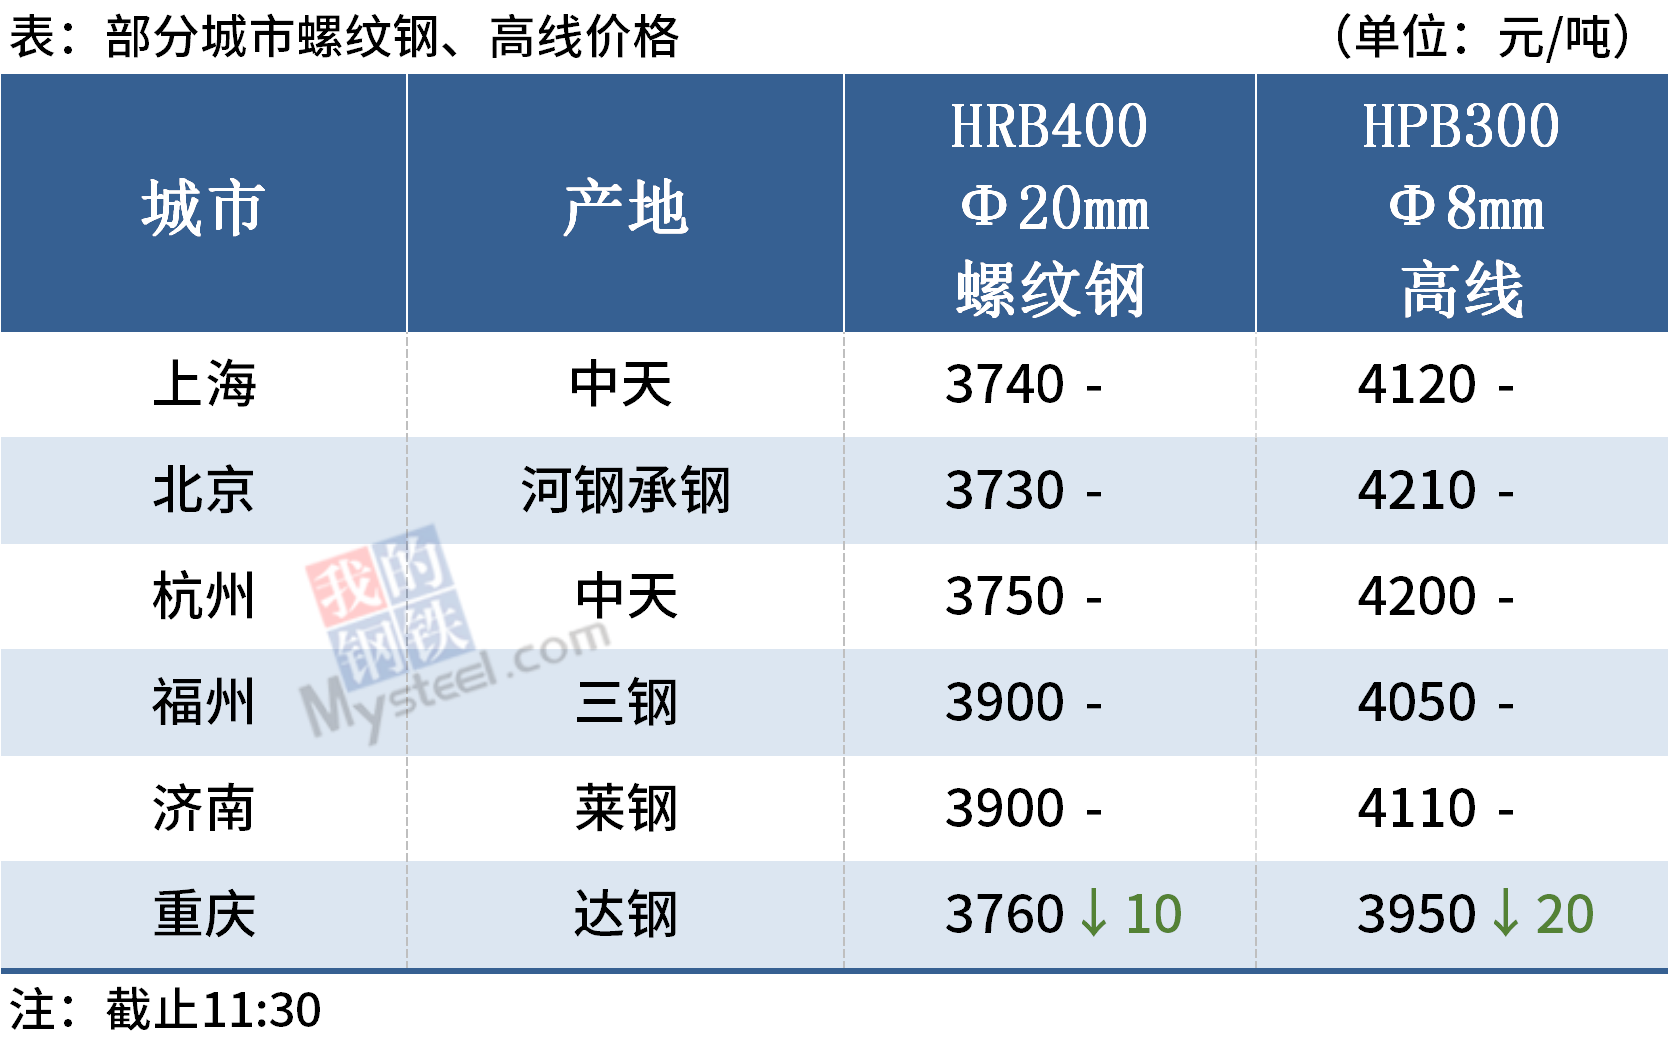 Mysteel午报:钢价偏弱运行,钢坯涨至3400